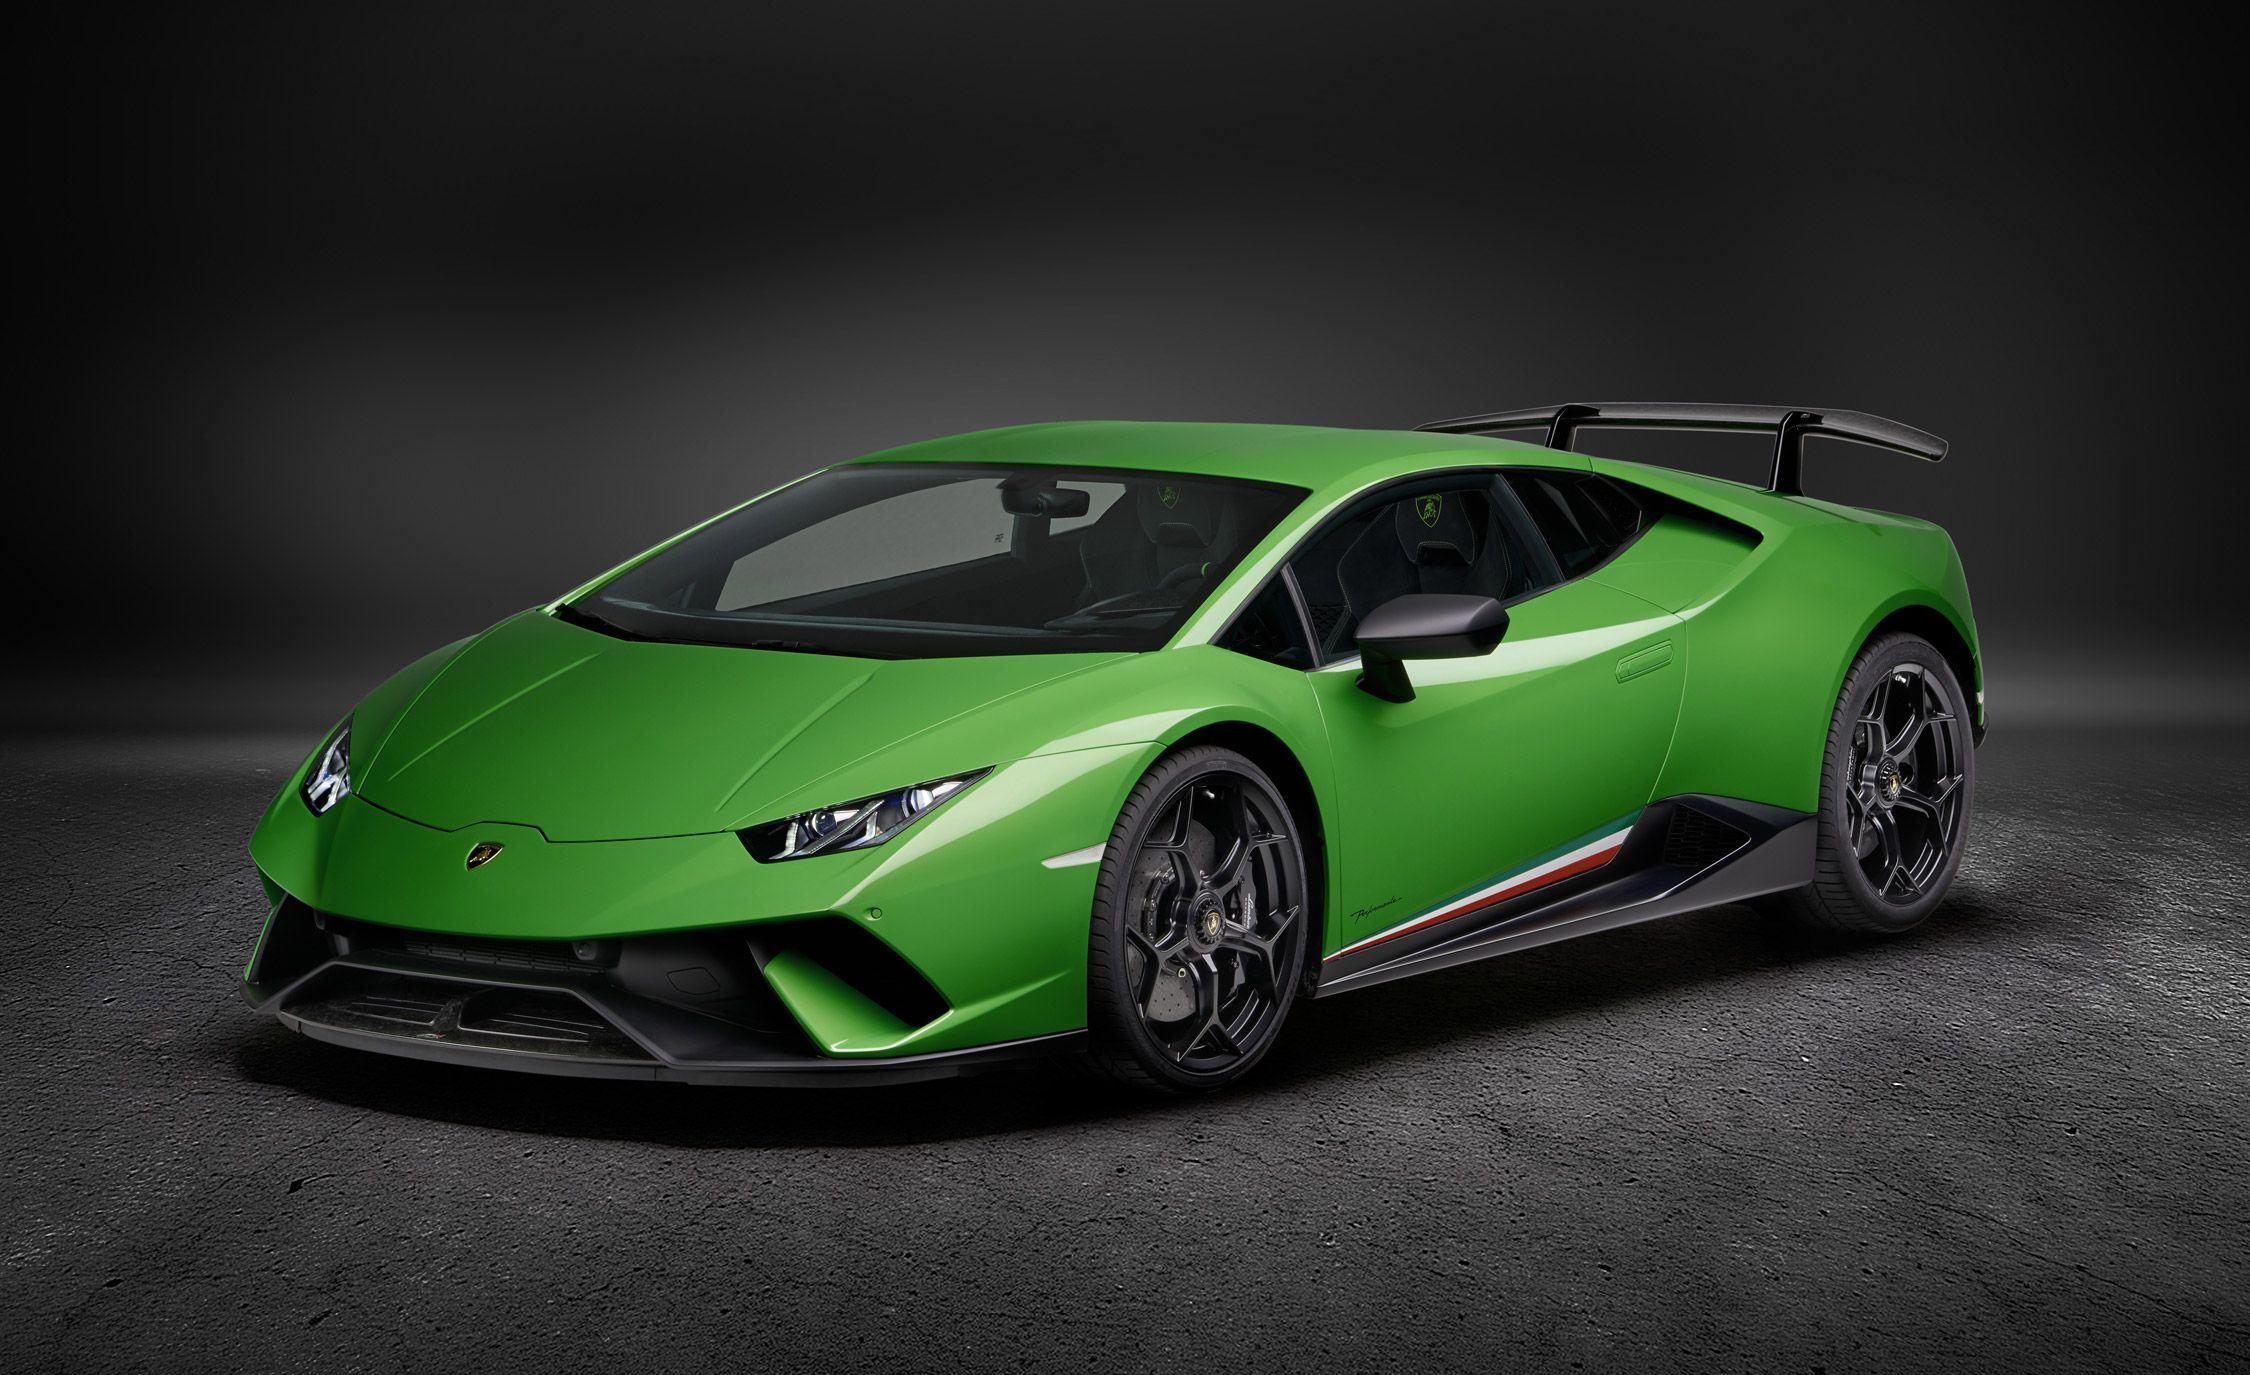 2018 Lamborghini Huracan Performante: More Power and Aero Trickery